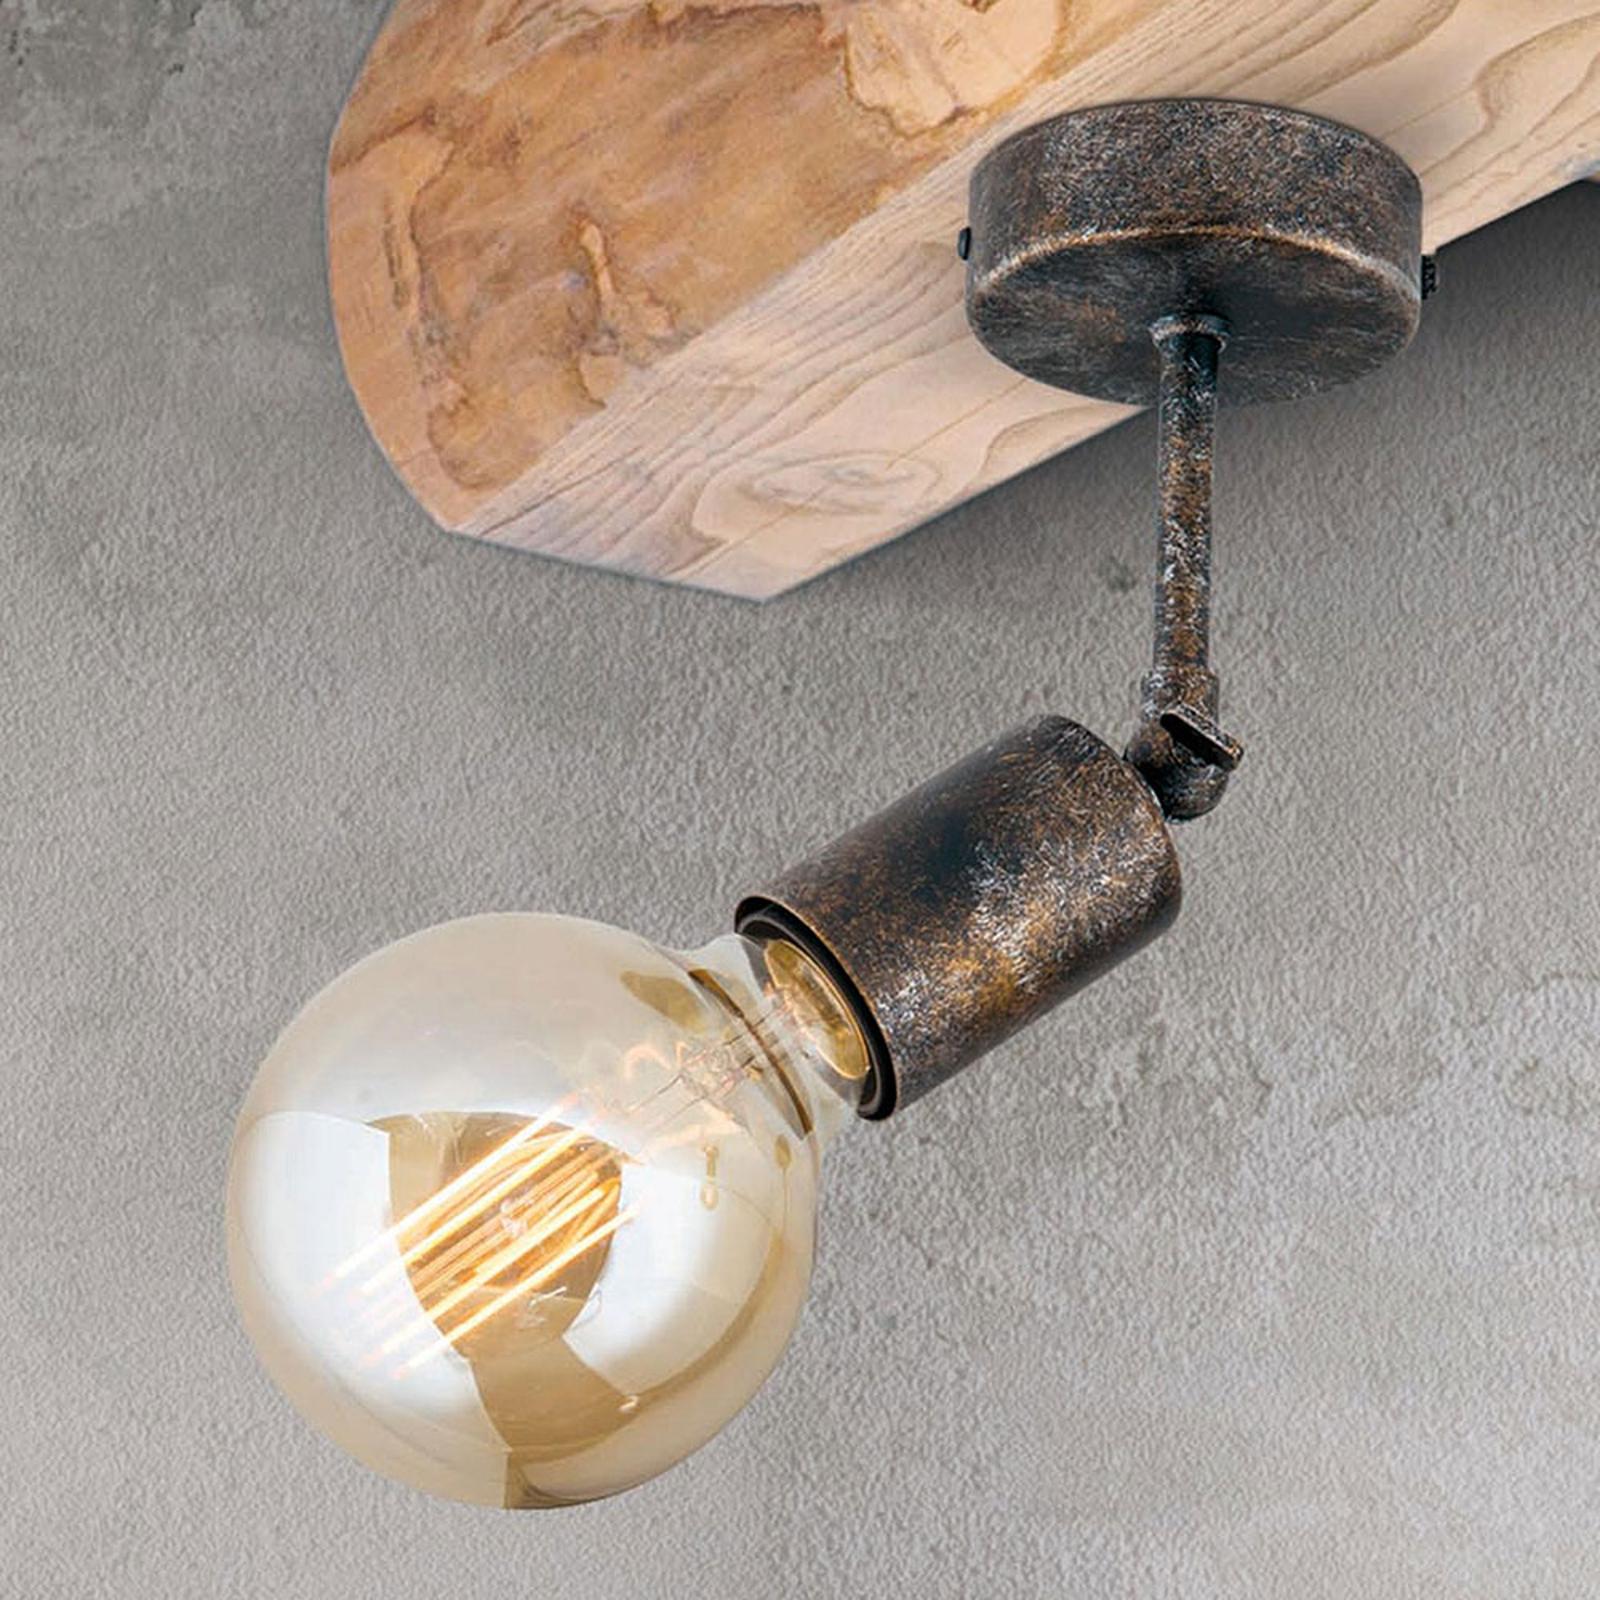 Ruchoma lampa sufitowa Rati w stylu vintage